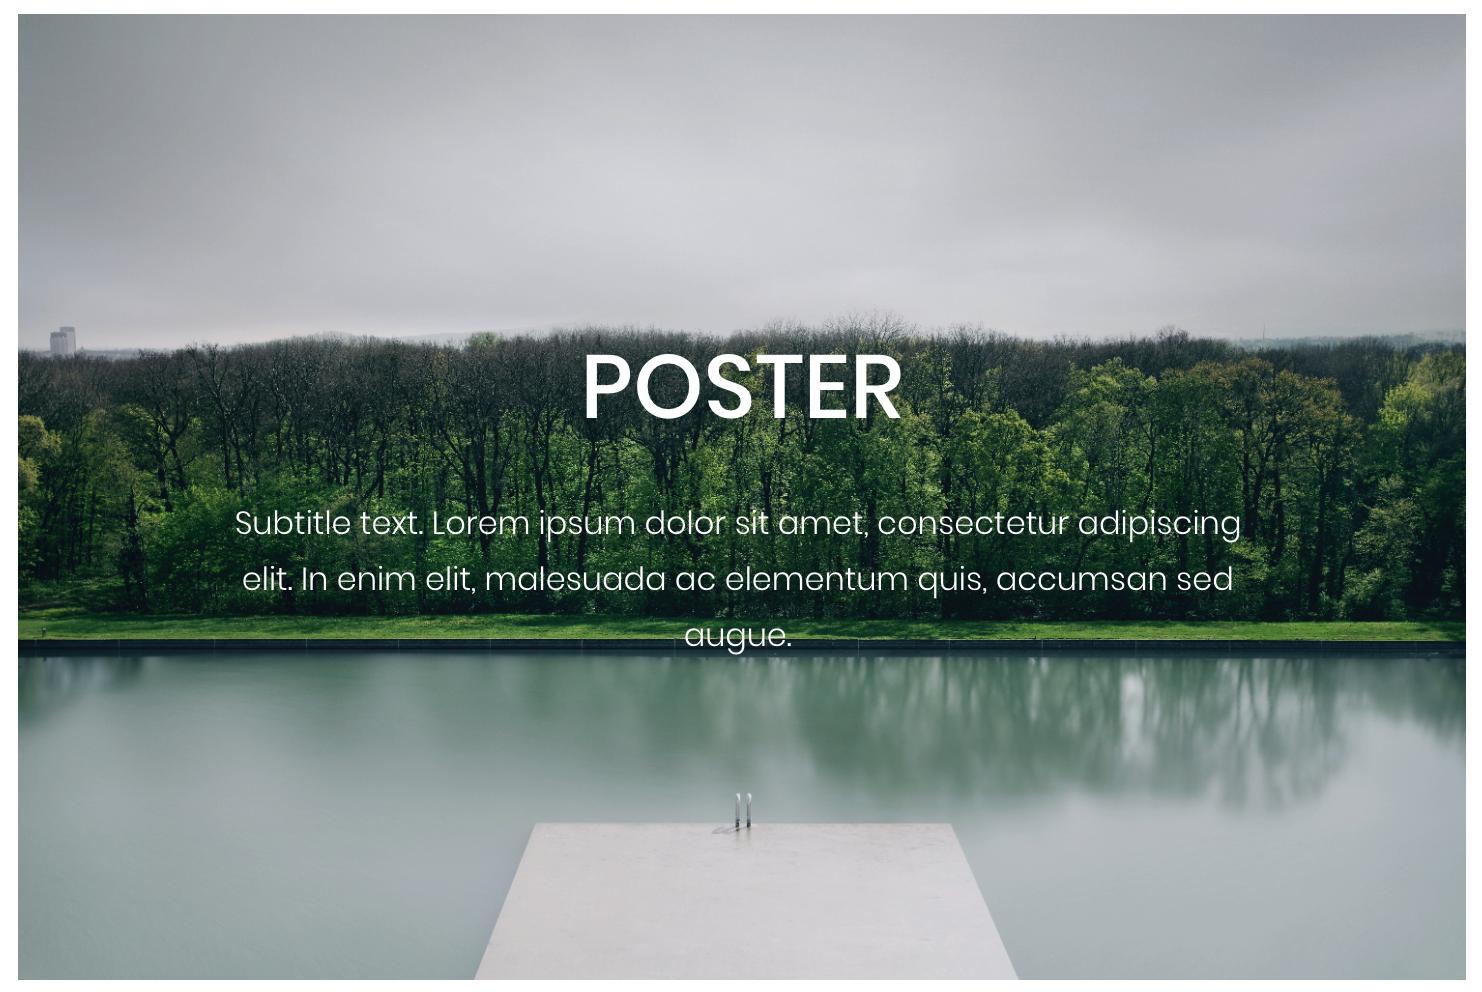 poster_image_block.png